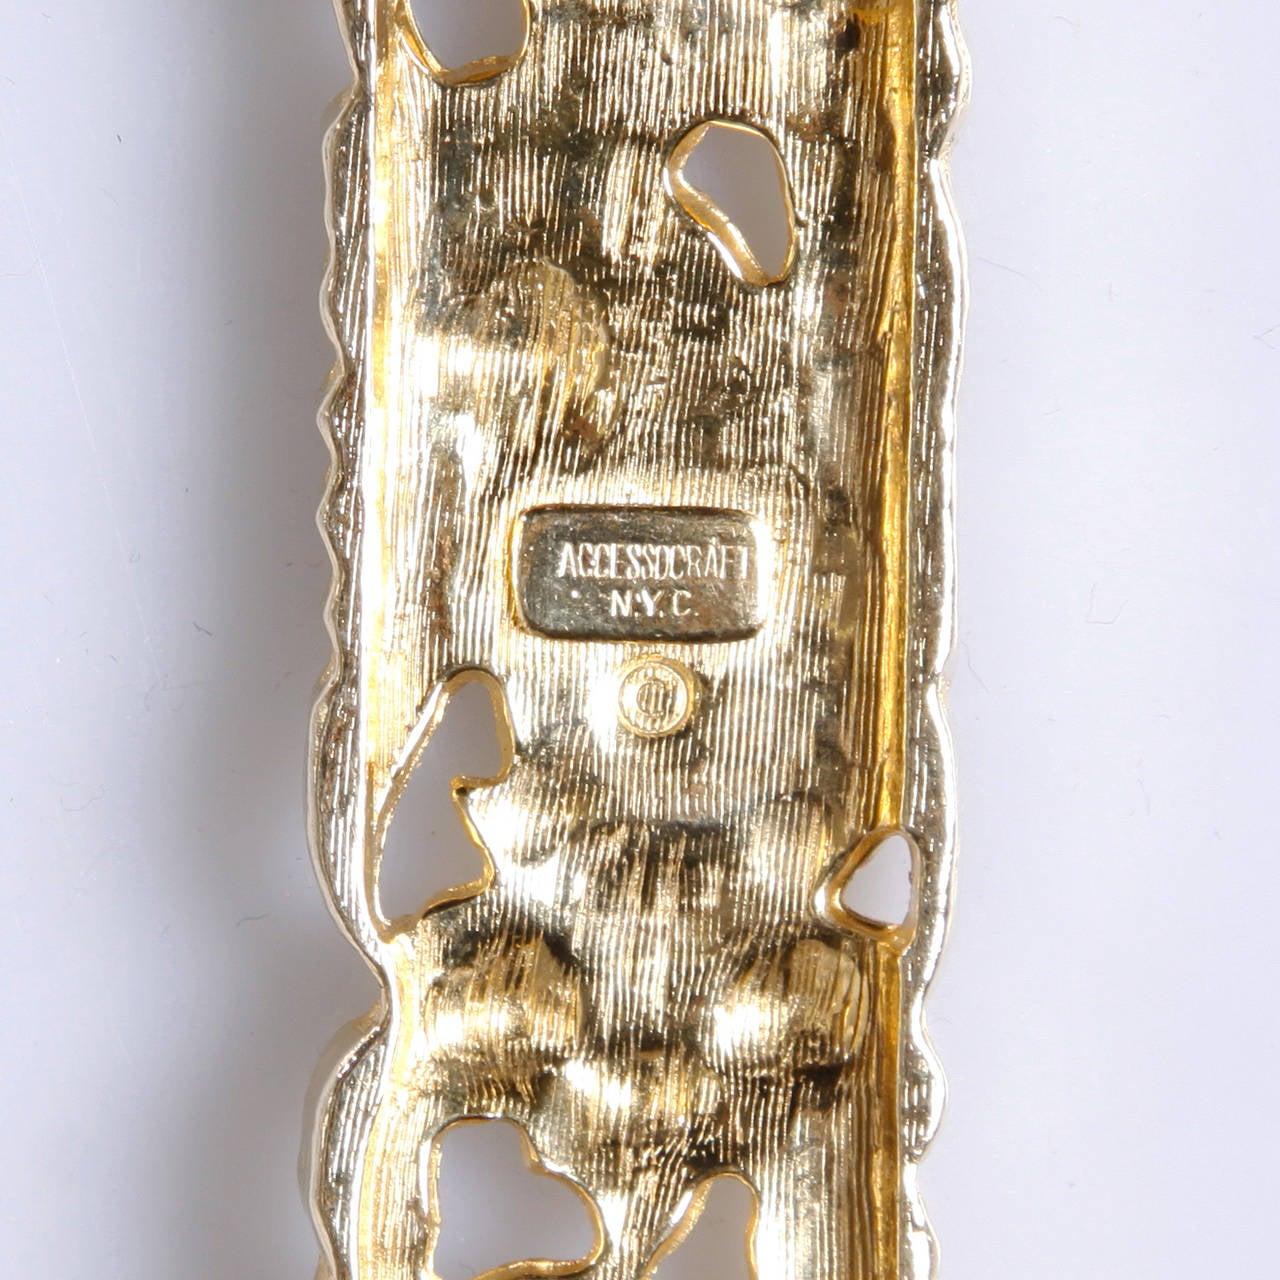 Accessocraft Vintage 1970s Gold Snake Chain Stretch Belt For Sale 4